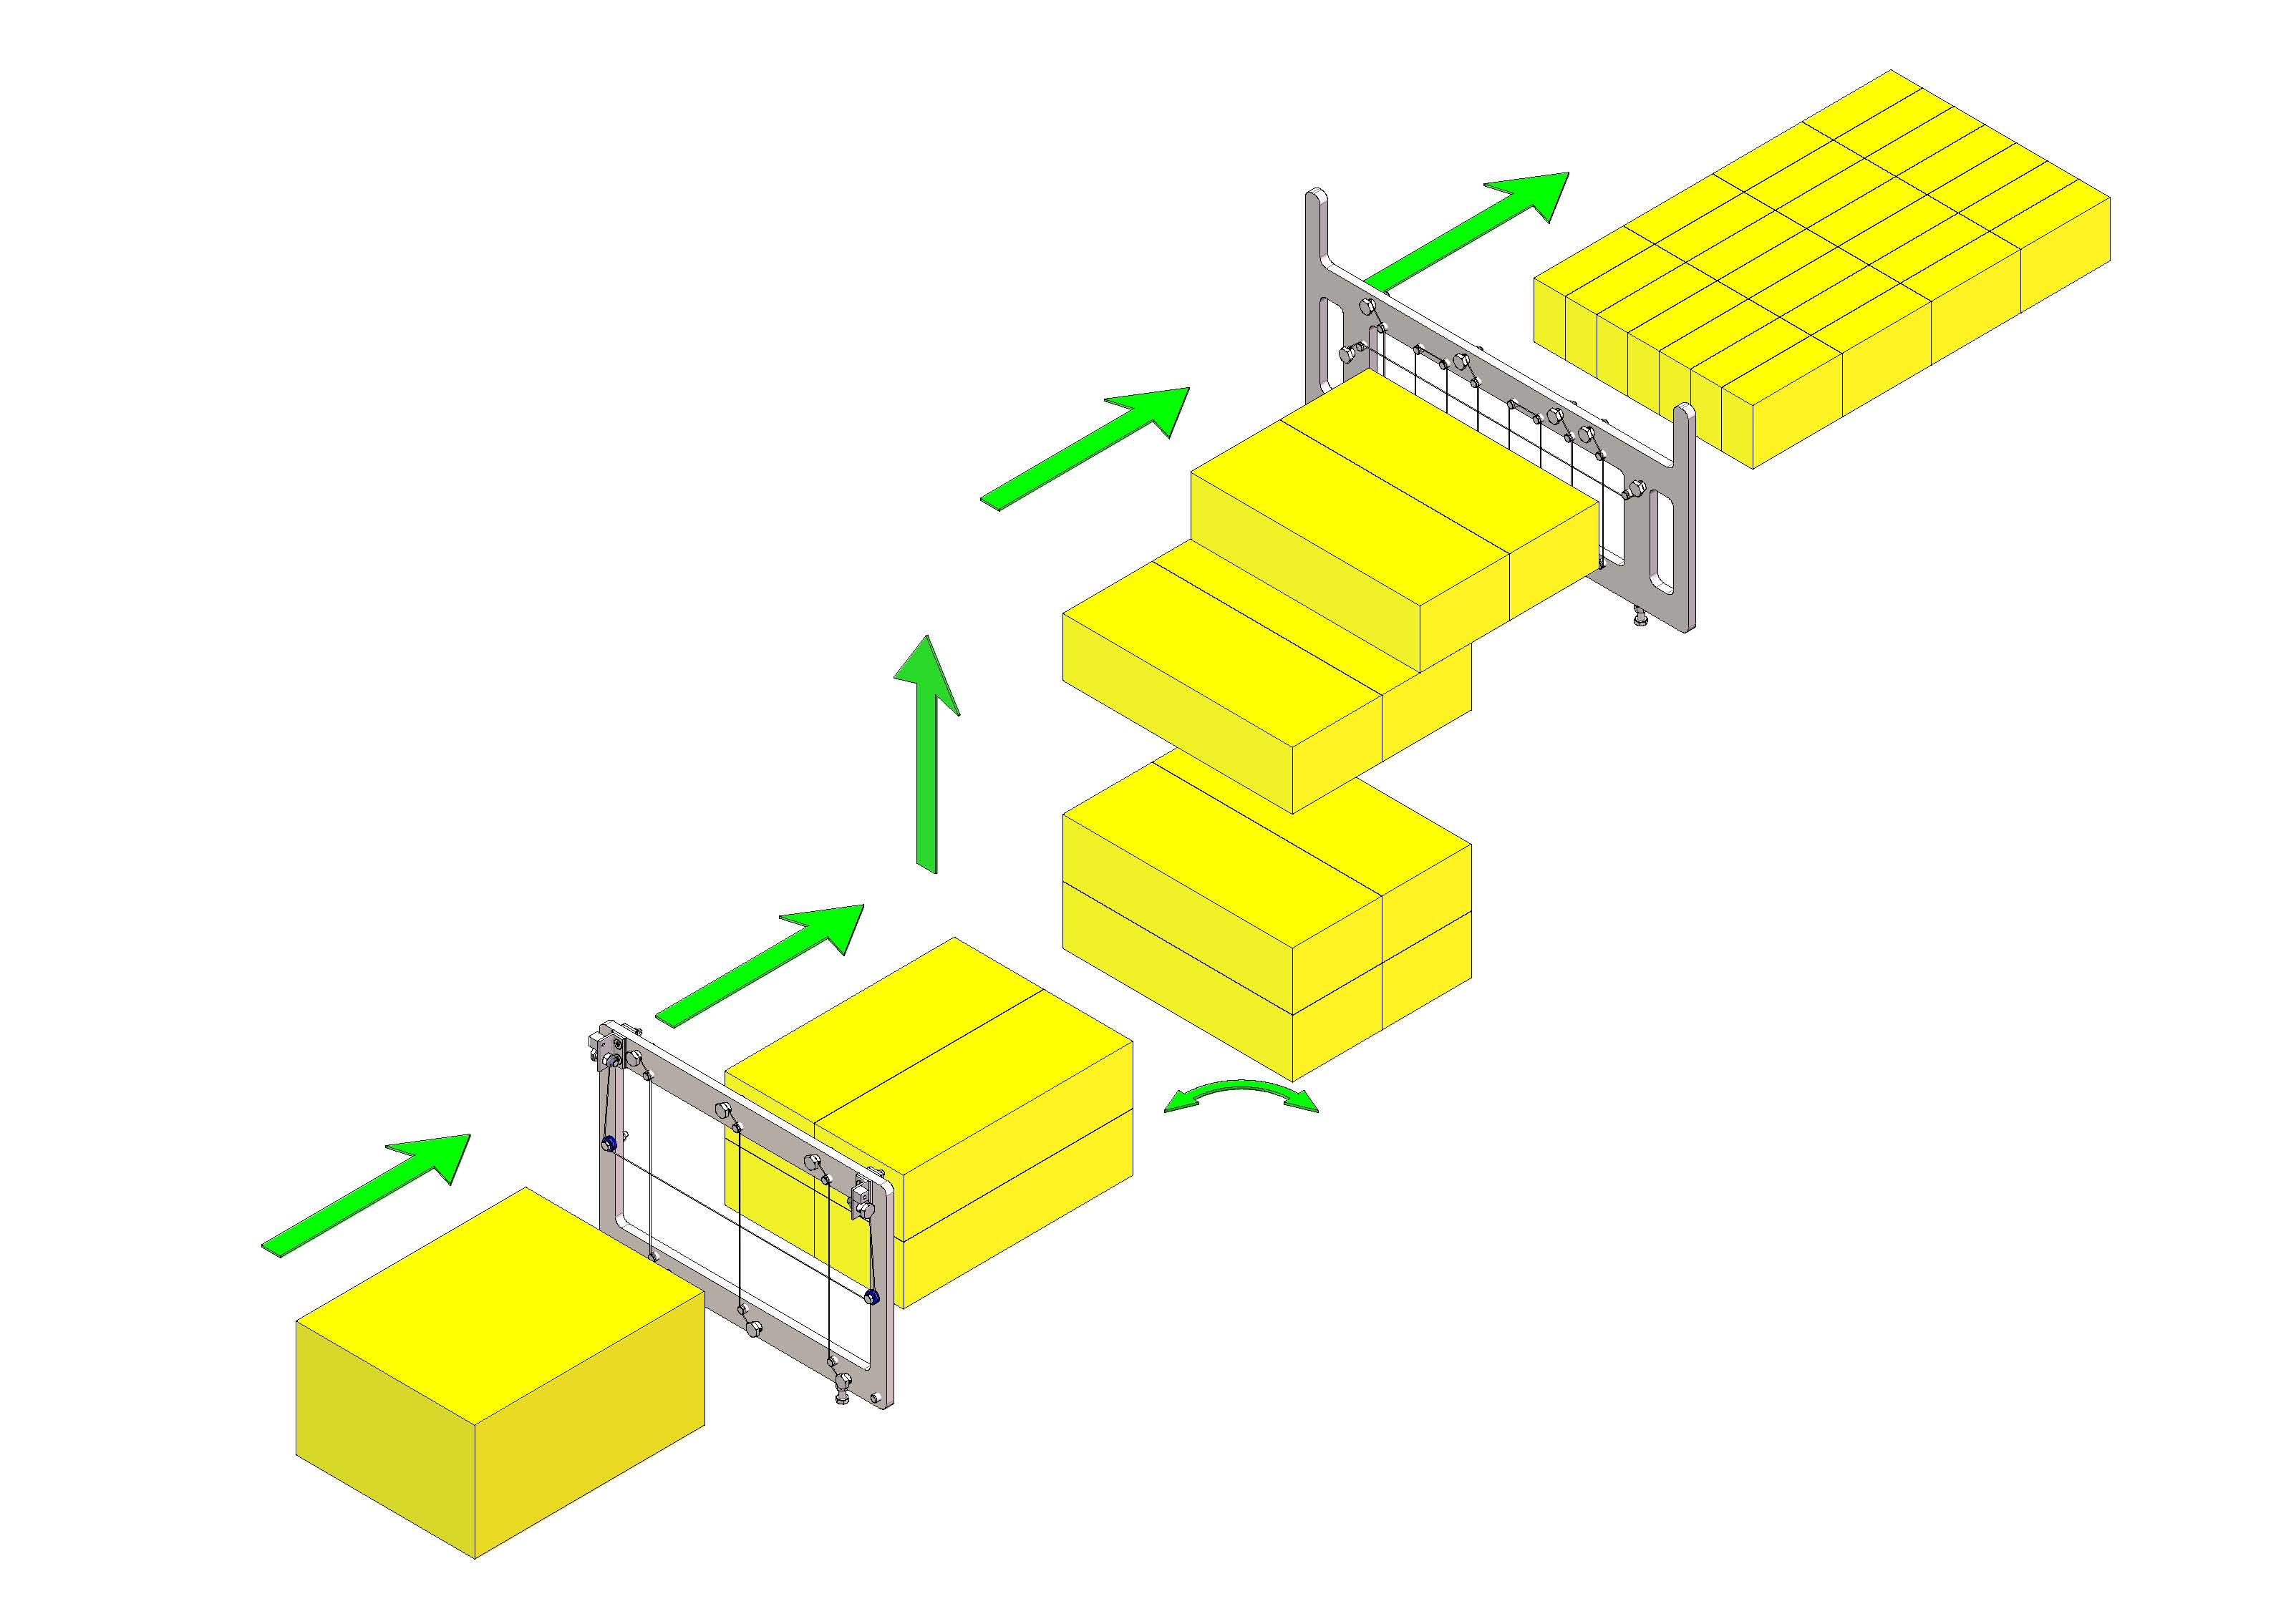 EC23 product flow diagram